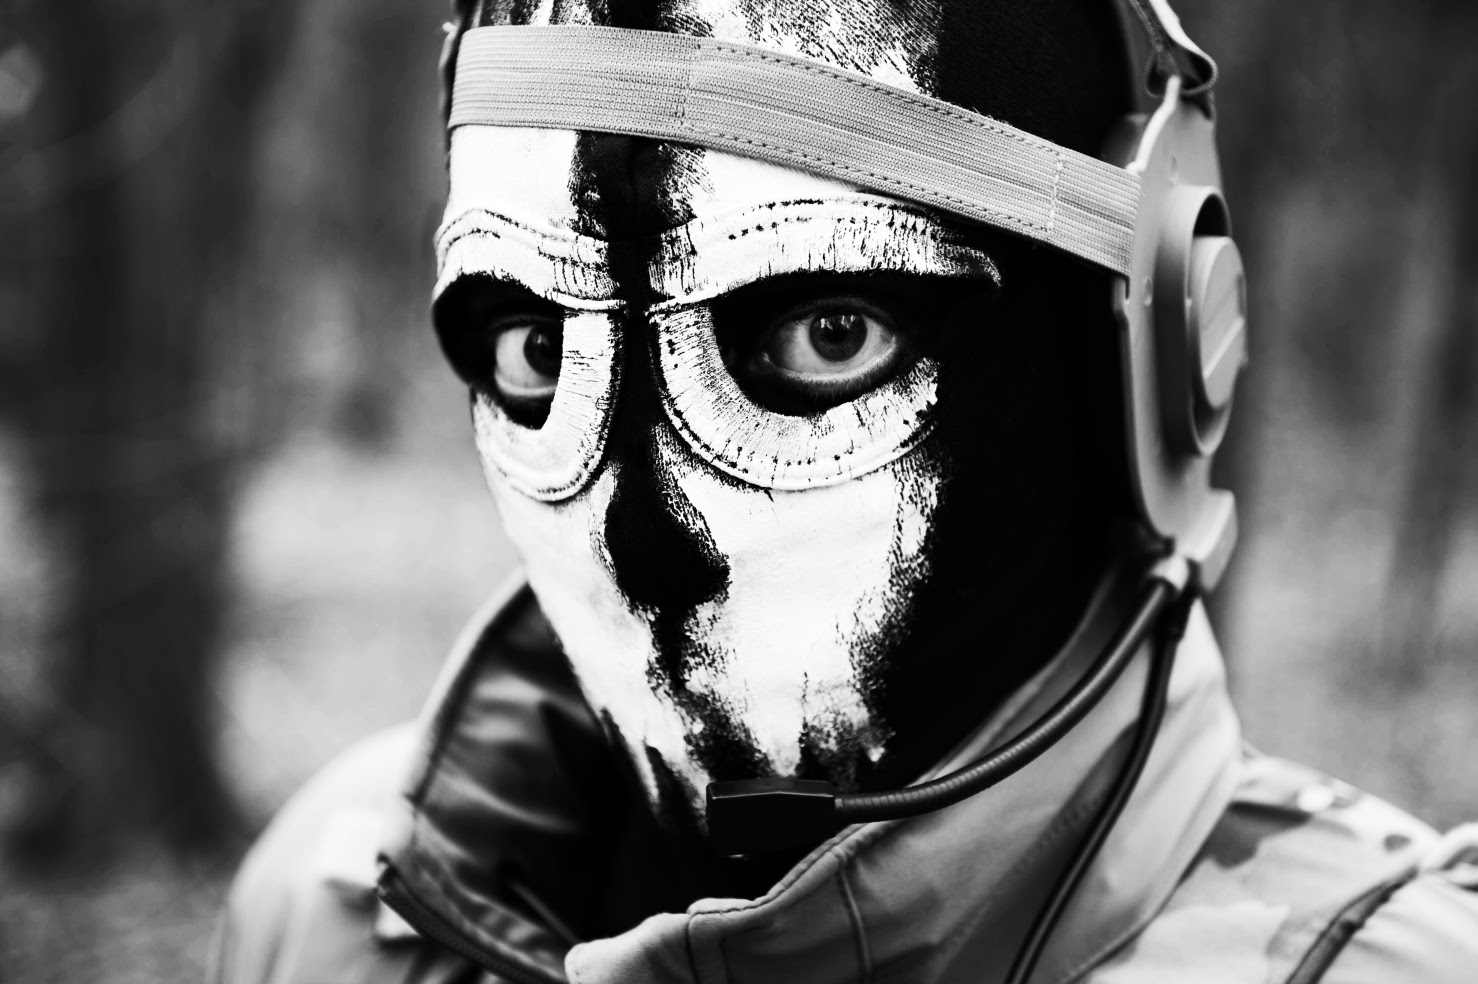 Cod Ghost Mask Warrior - klejonka